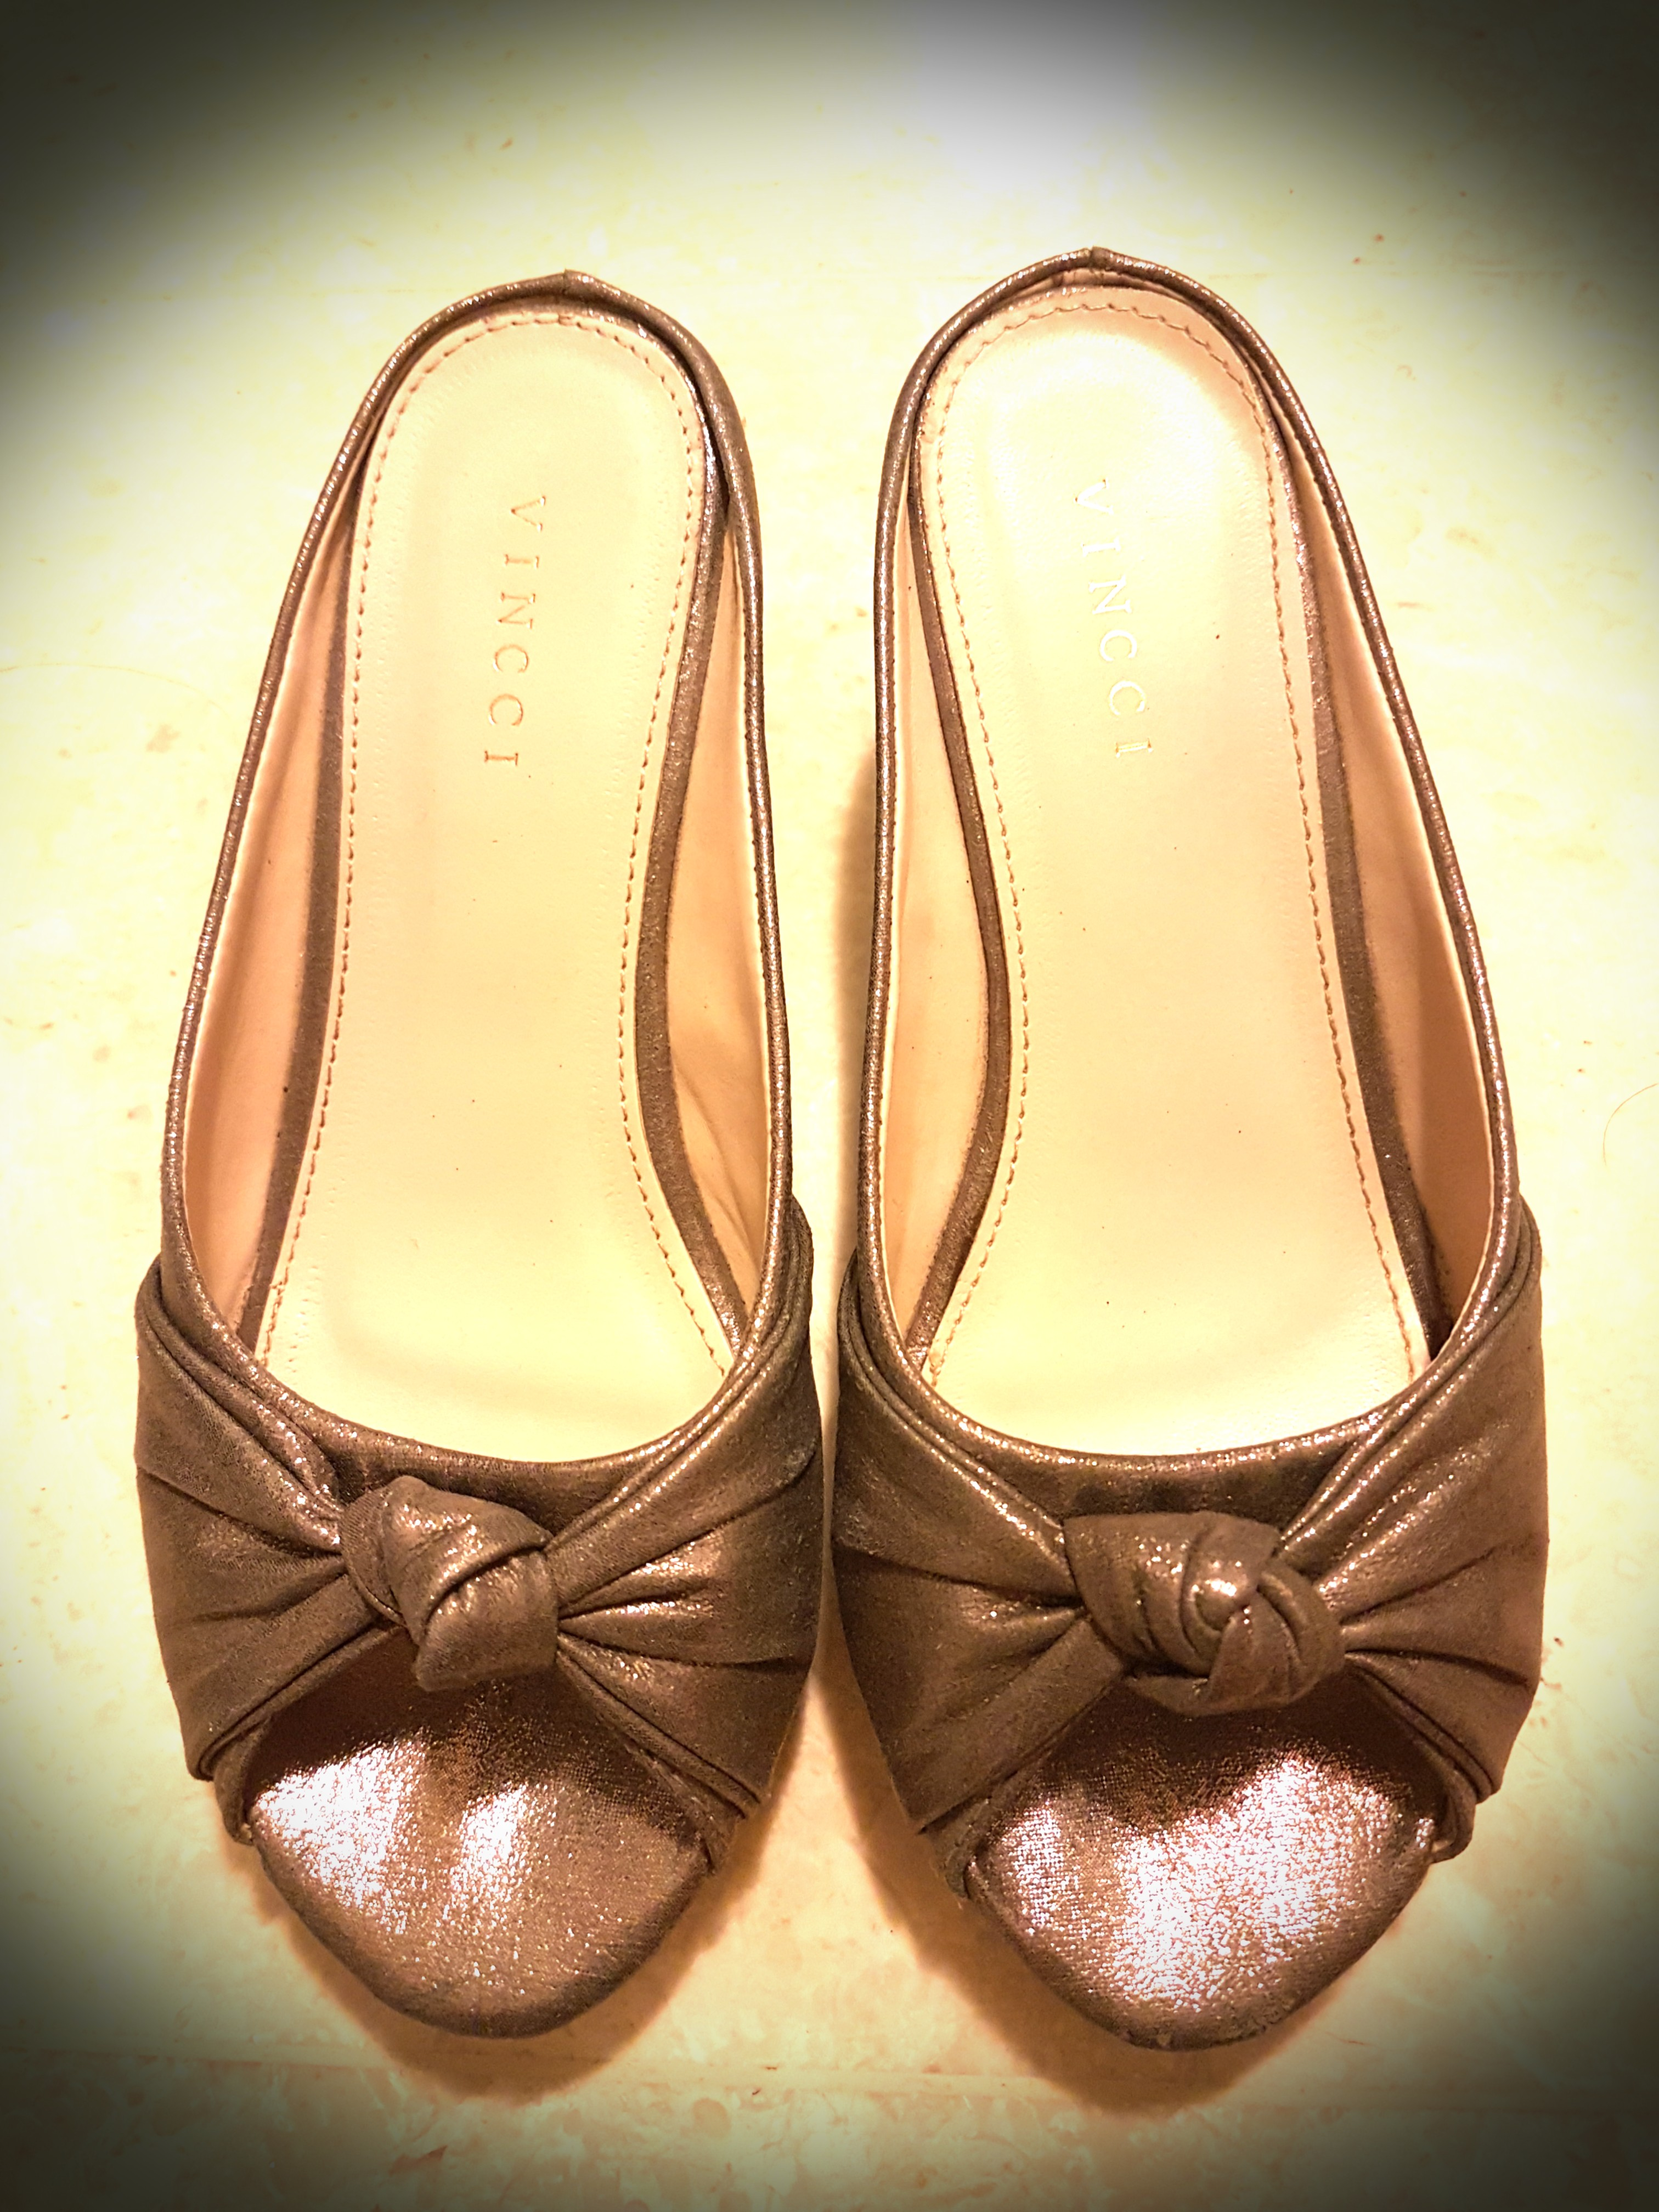 5a822fa6 Vincci Metallic Platform Shoes, Women's Fashion, Shoes, Heels on ...